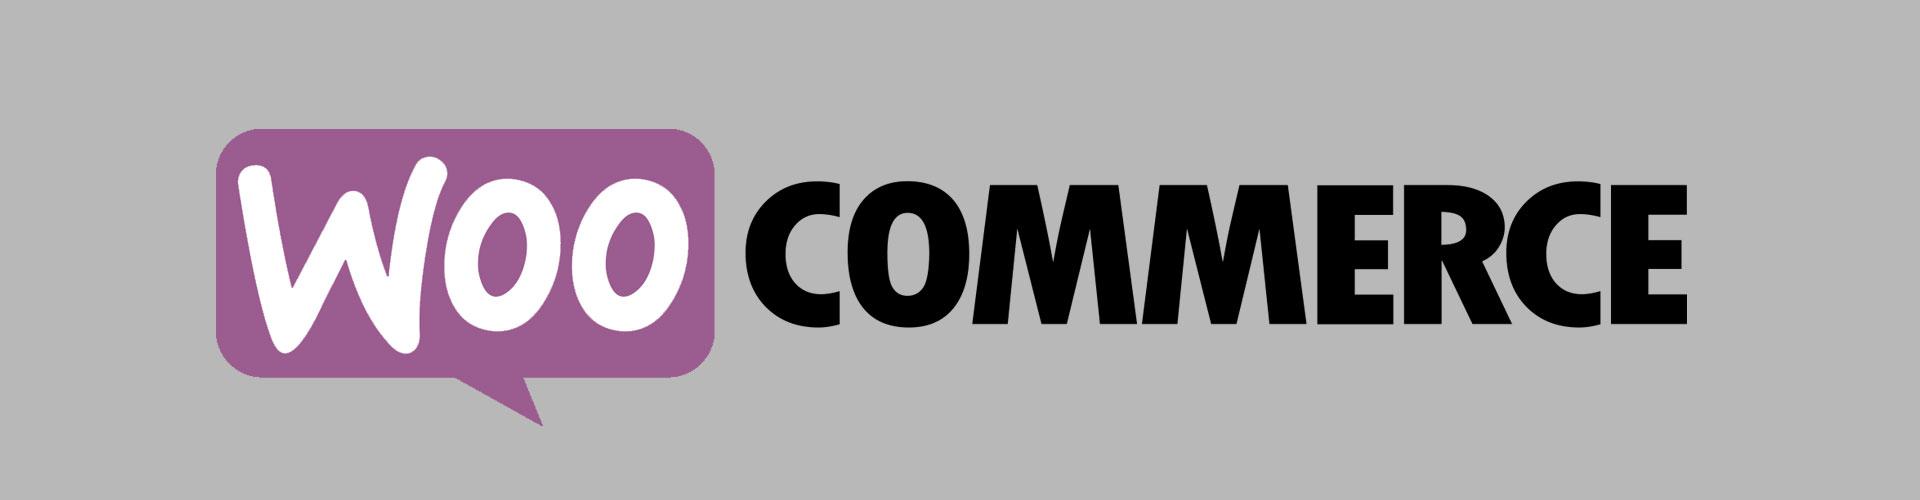 WooCommerce Web Design Johannesburg